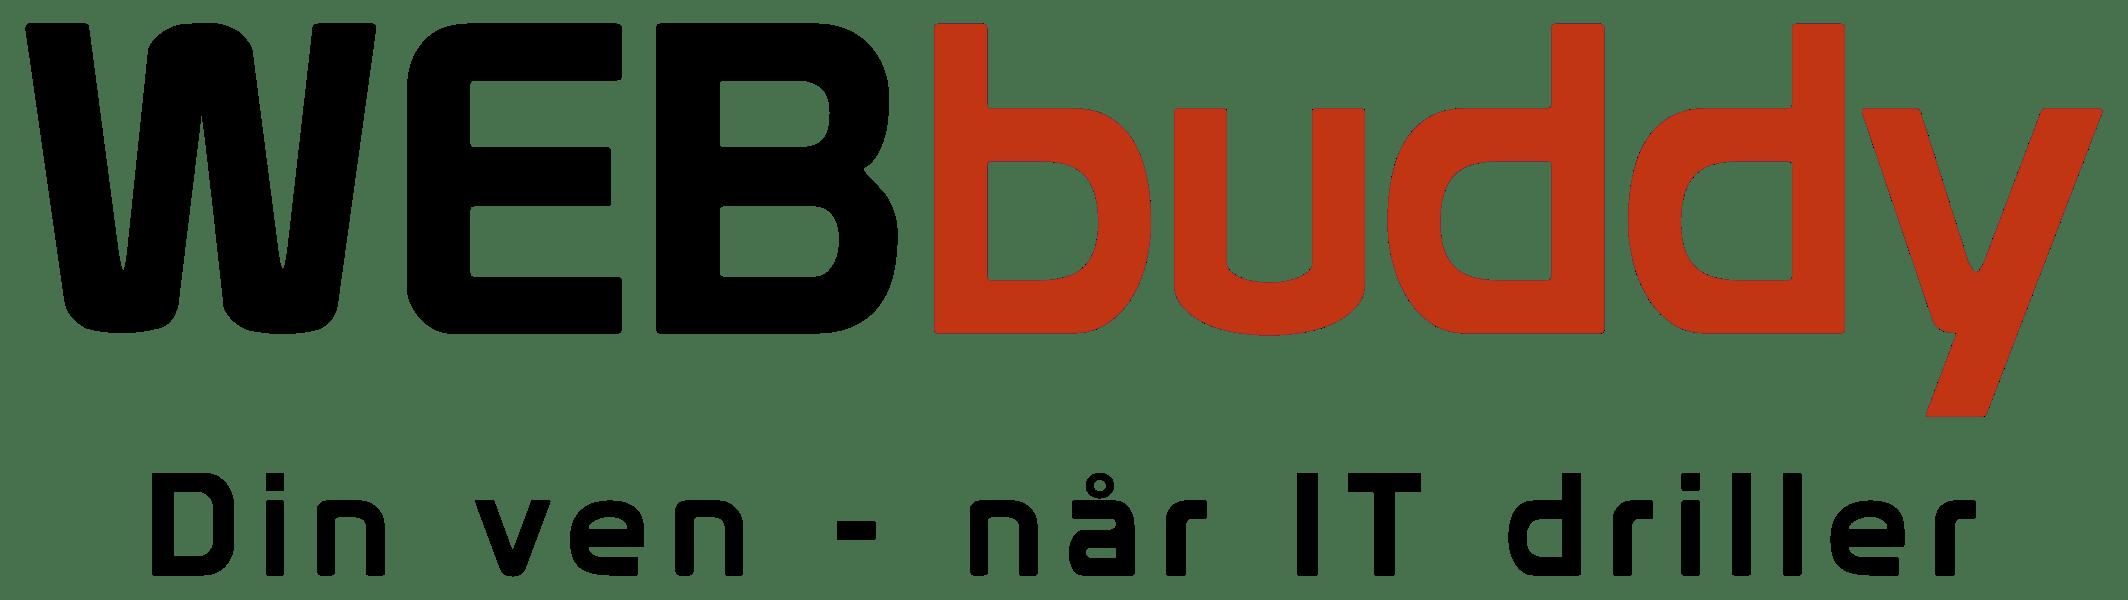 WEBbuddy.dk